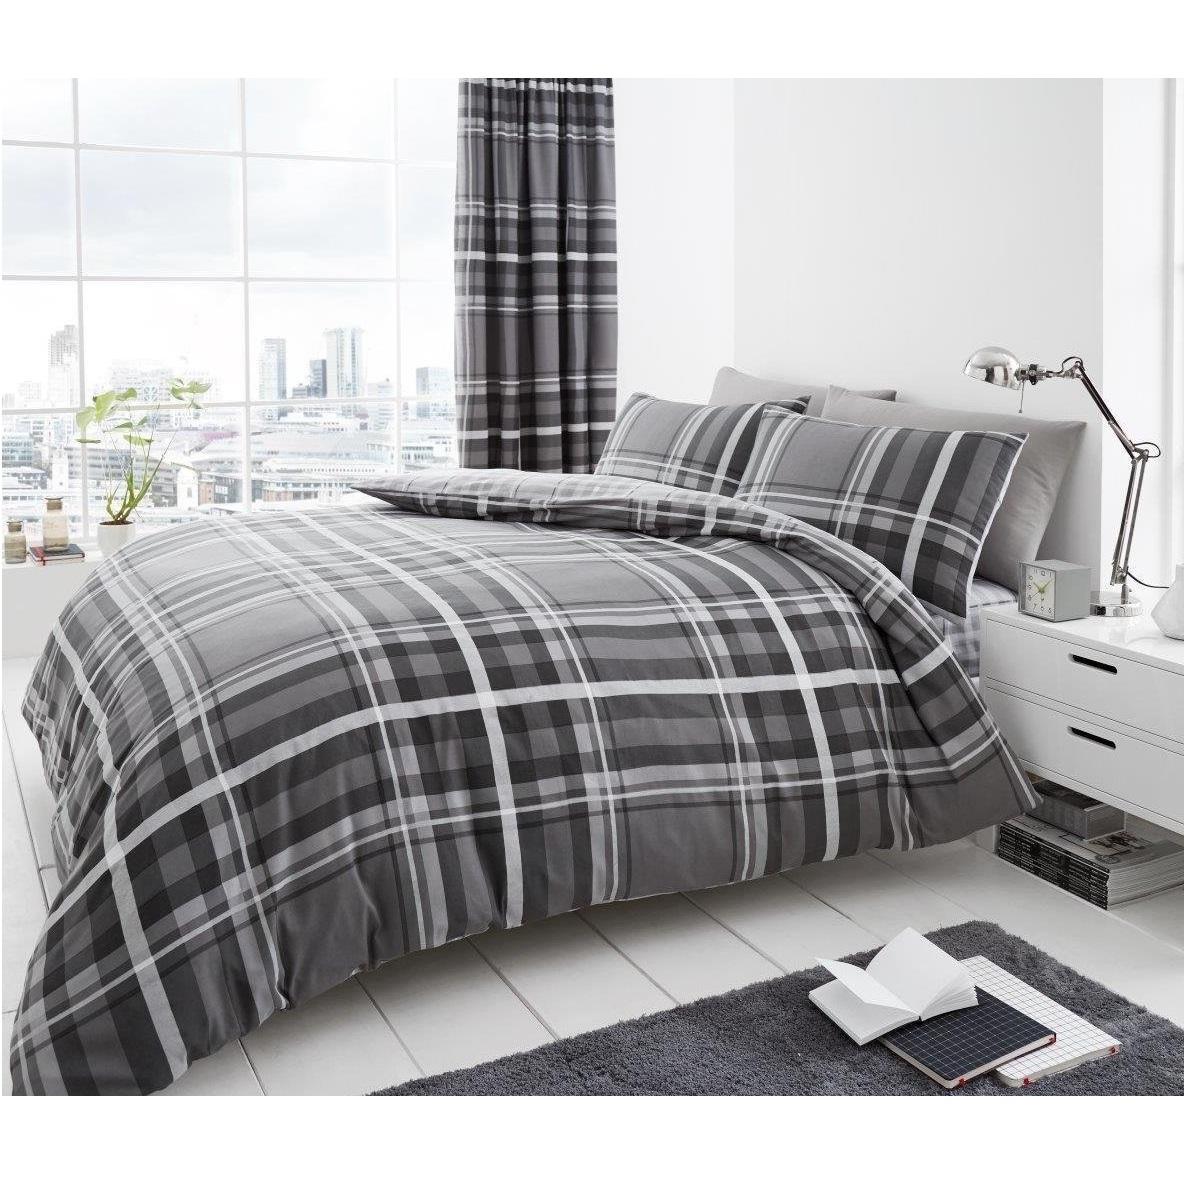 Luxury Newton Tartan Check Duvet Quilt Cover Bedding Bed Set Charcoal Grey Black Ebay